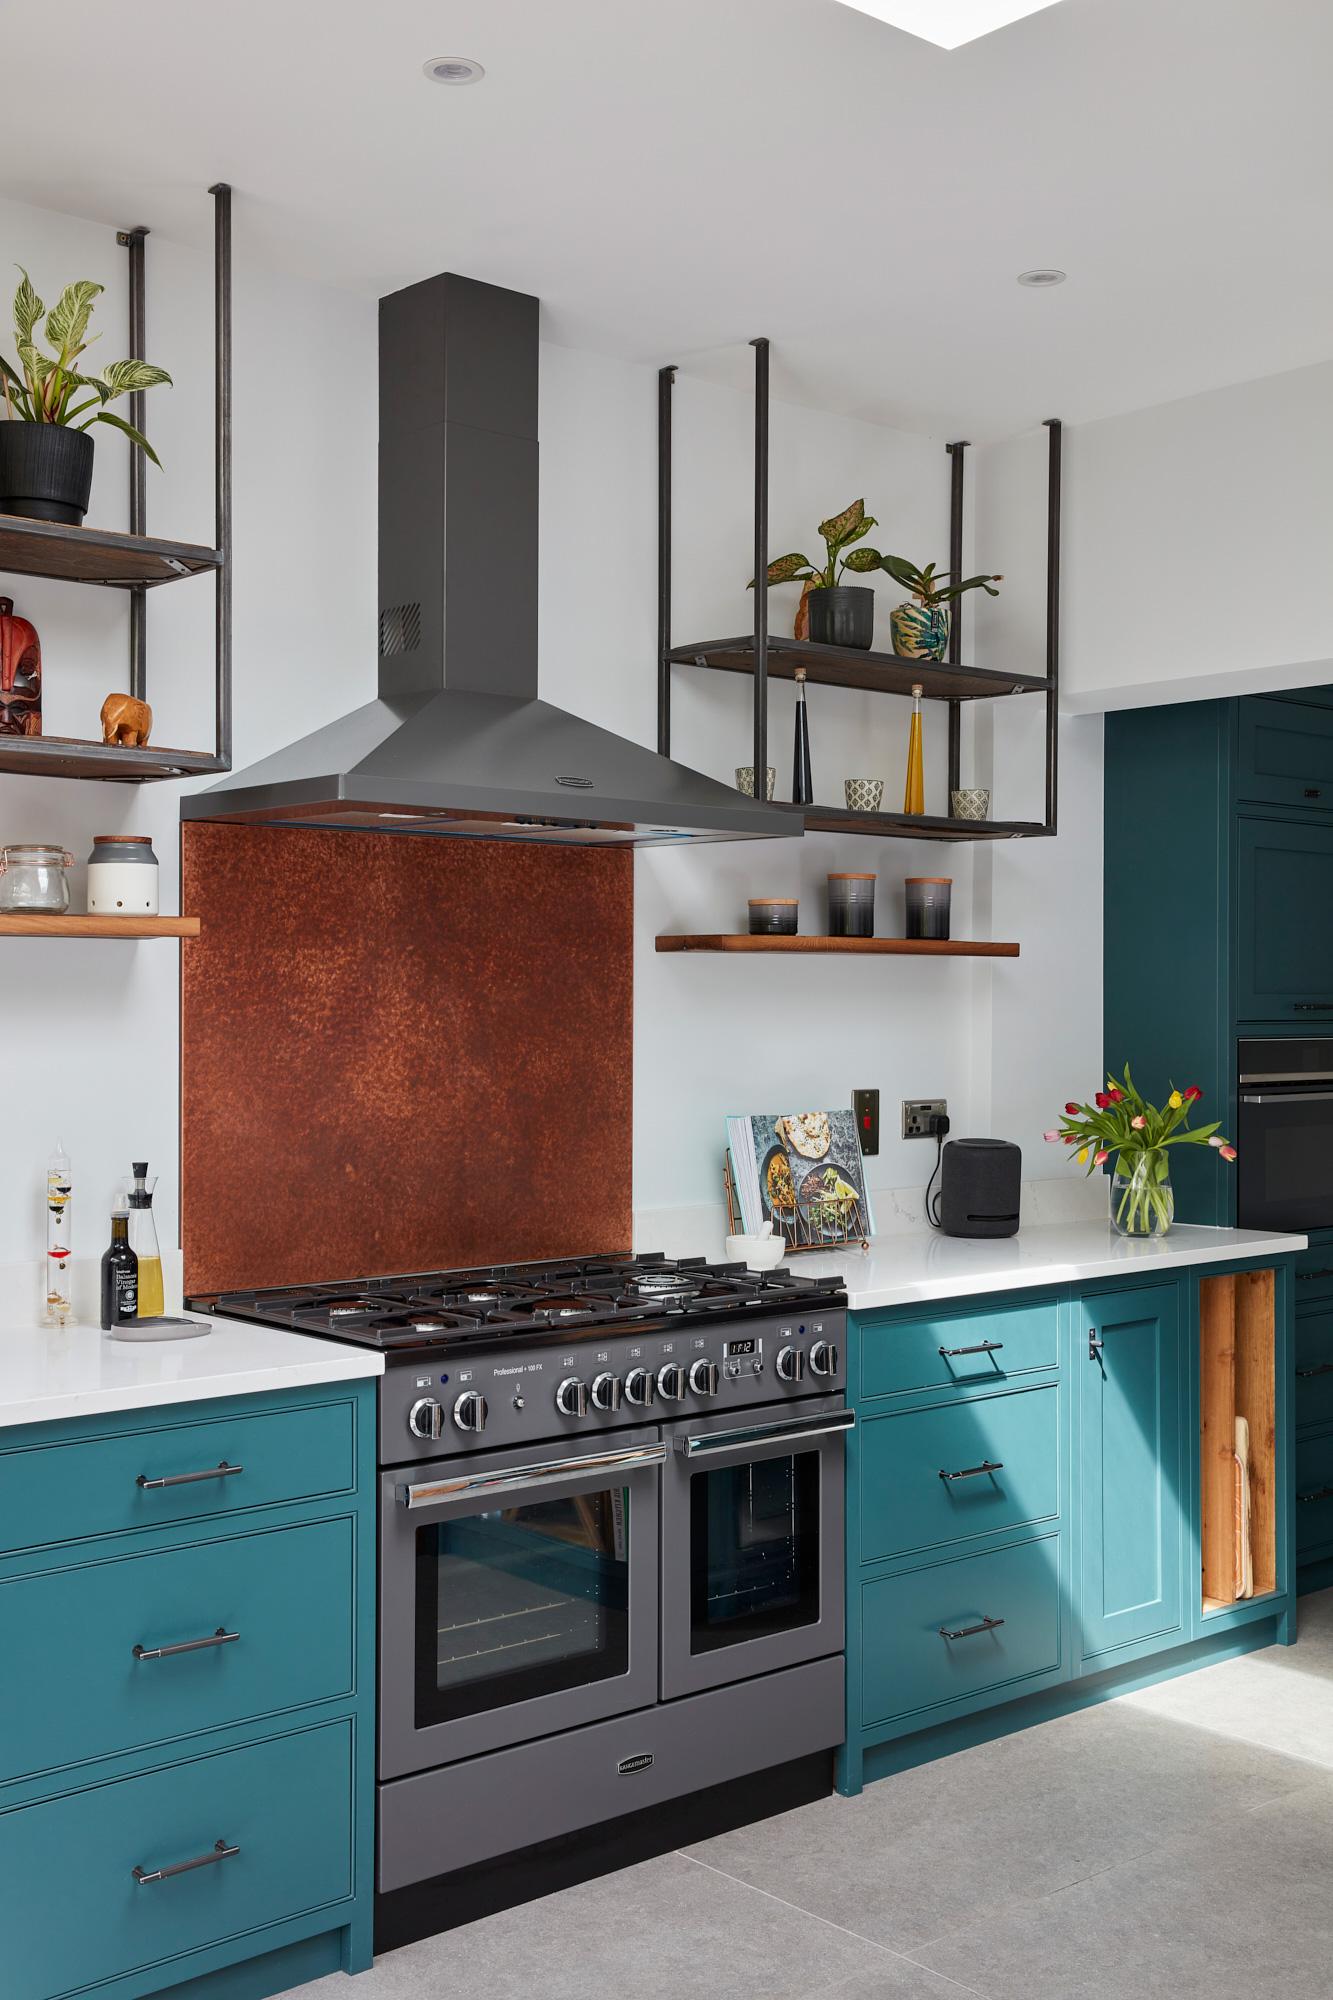 Copper backsplash in bespoke painted industrial kitchen